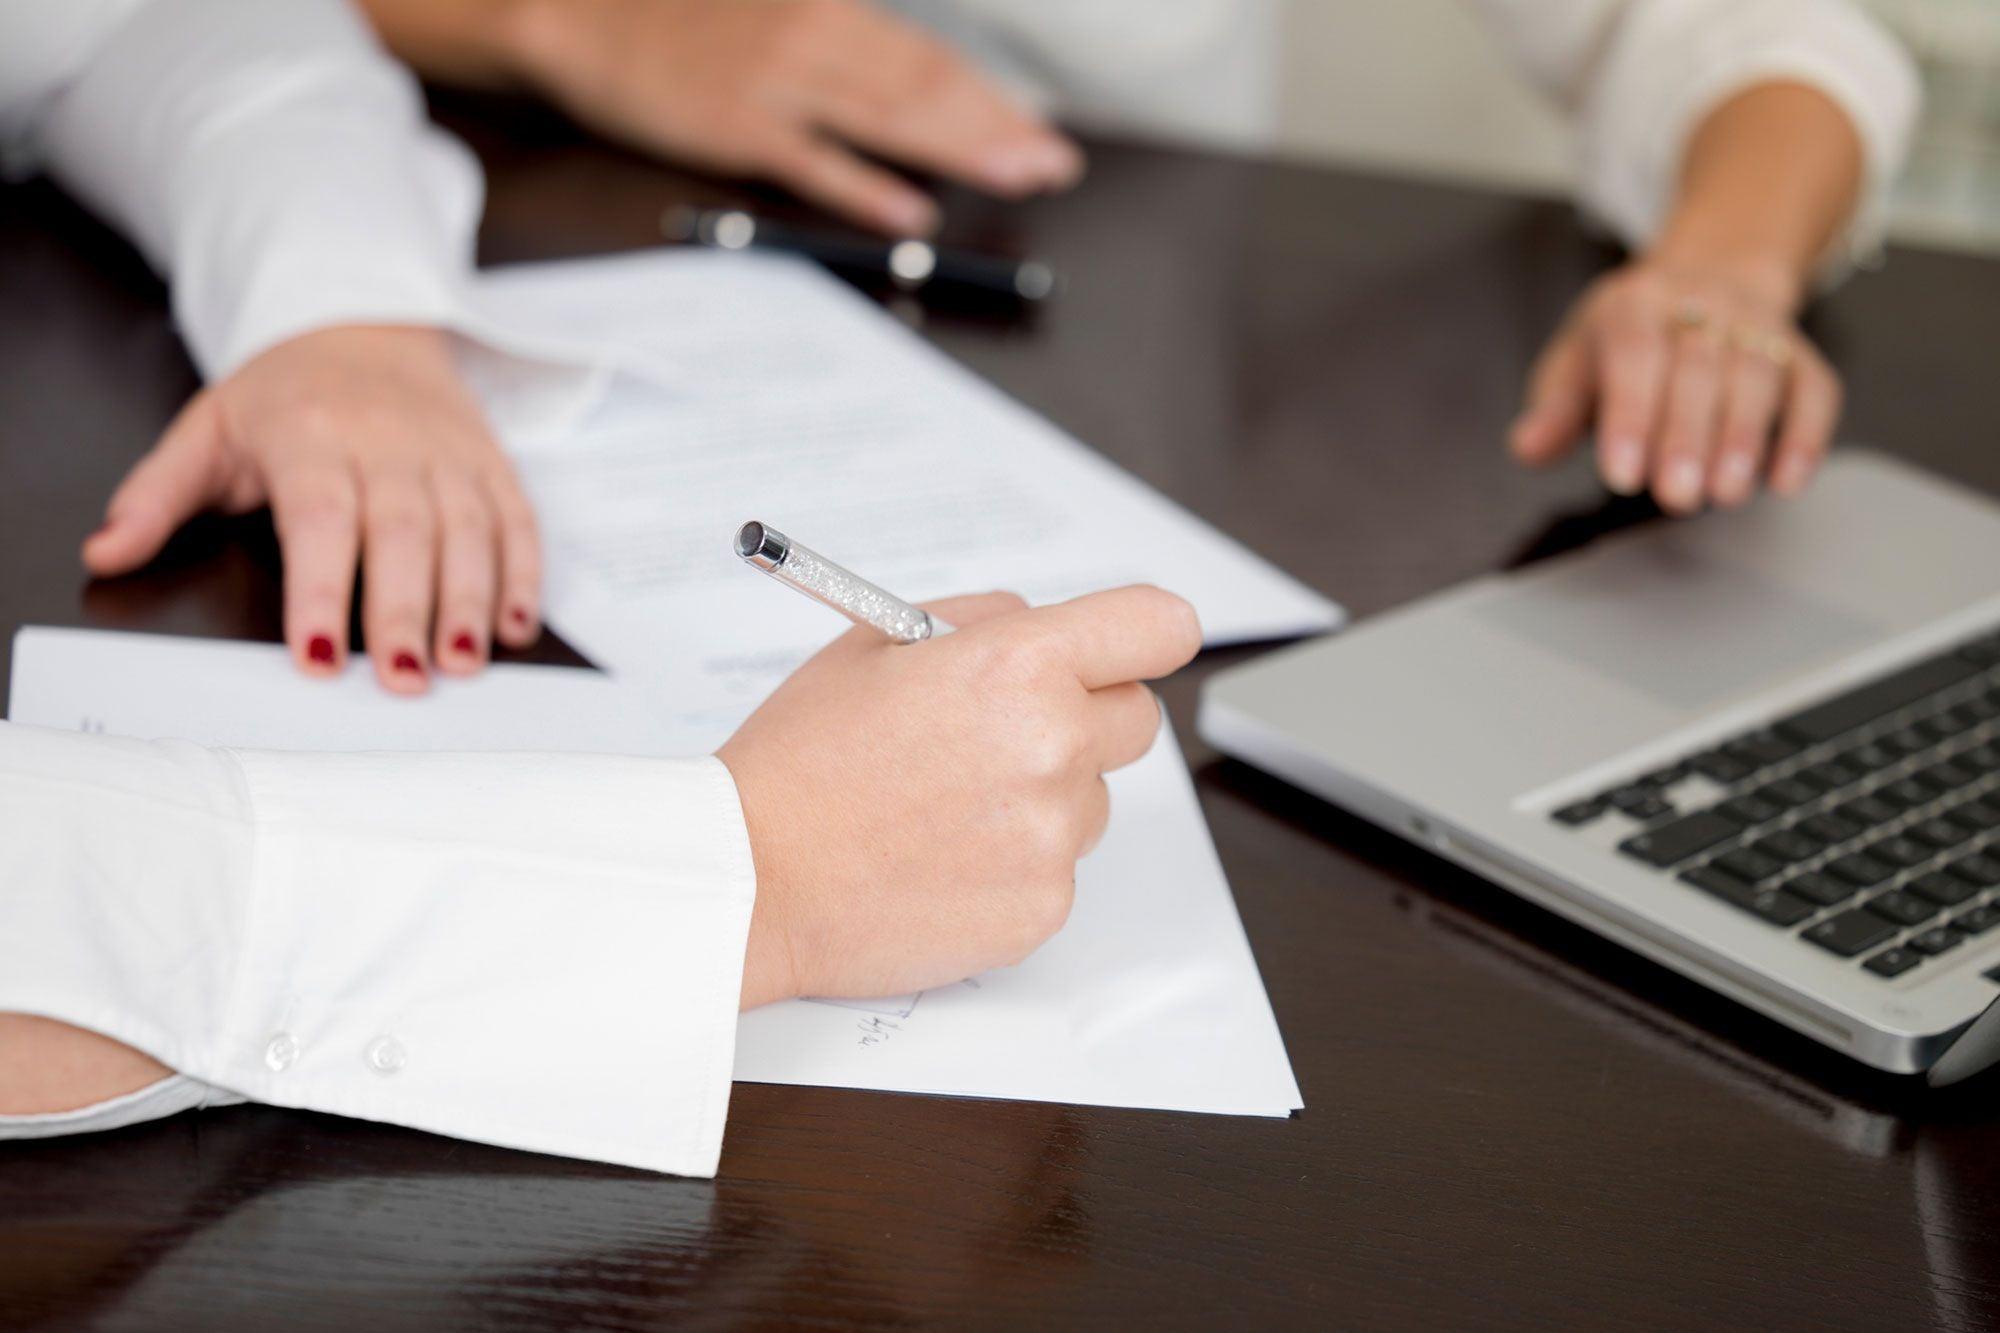 How Problem-Solving Case Studies Help You Market Your Business